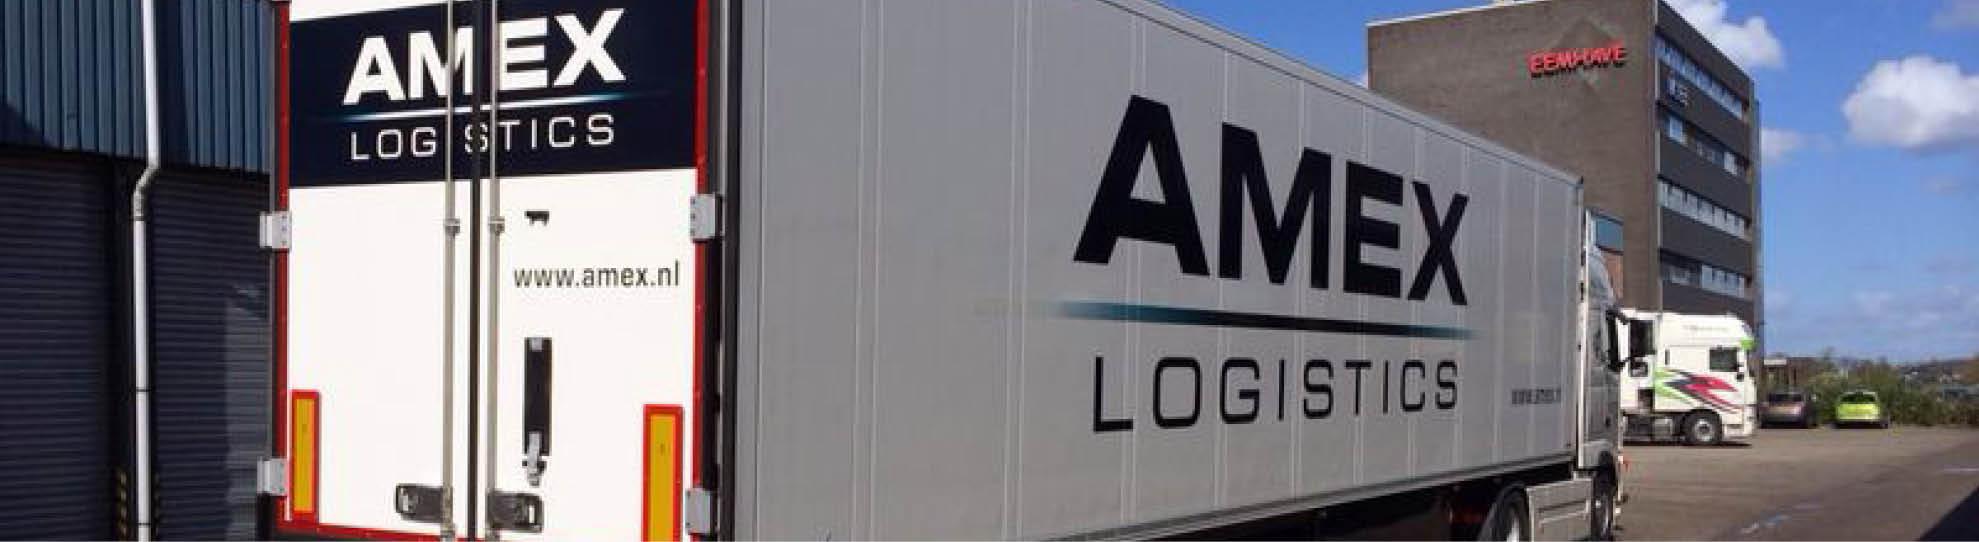 amex_groupage_transportation